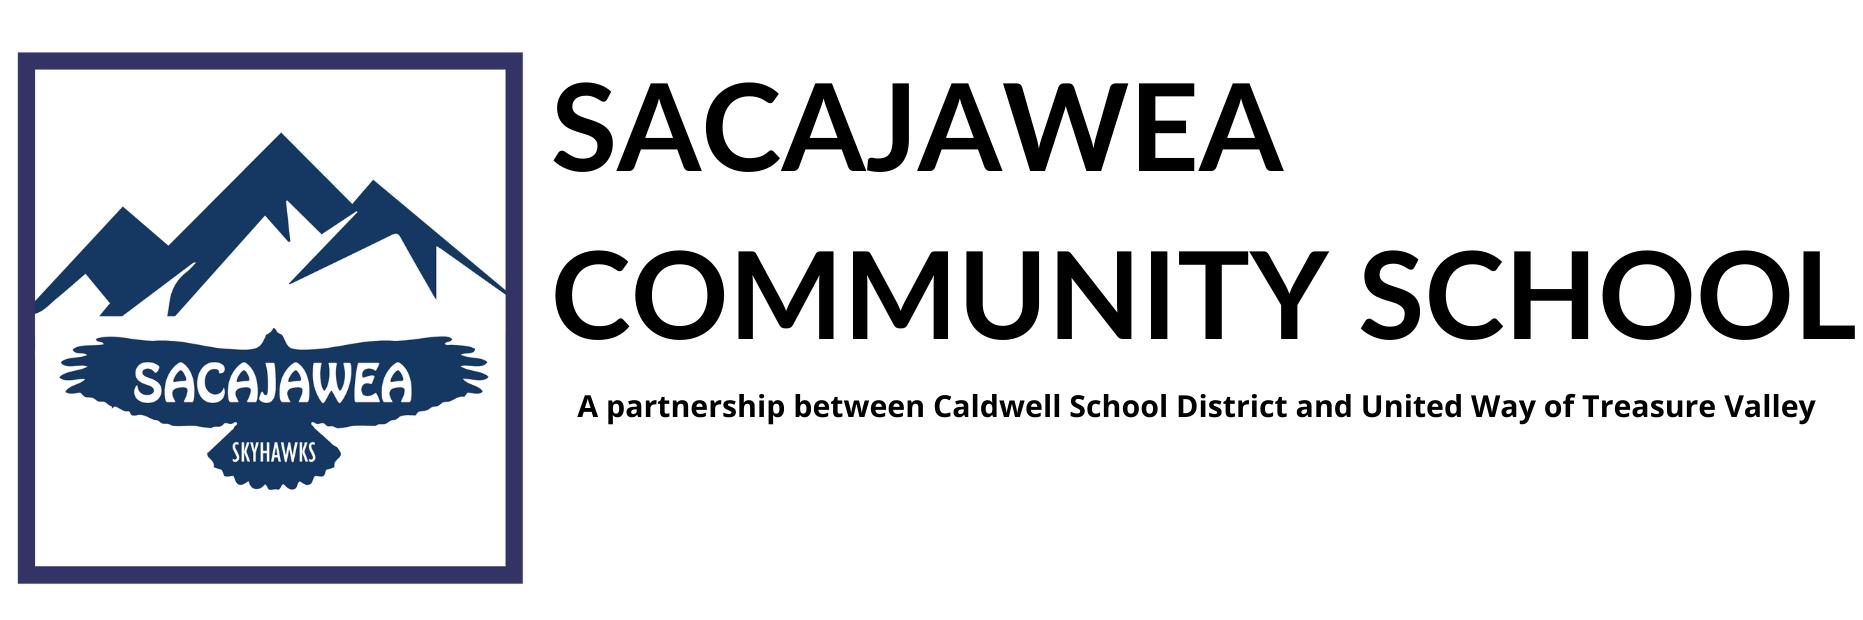 Sacajawea Community School: A partnership between Caldwell School District and United Way of Treasure Valley